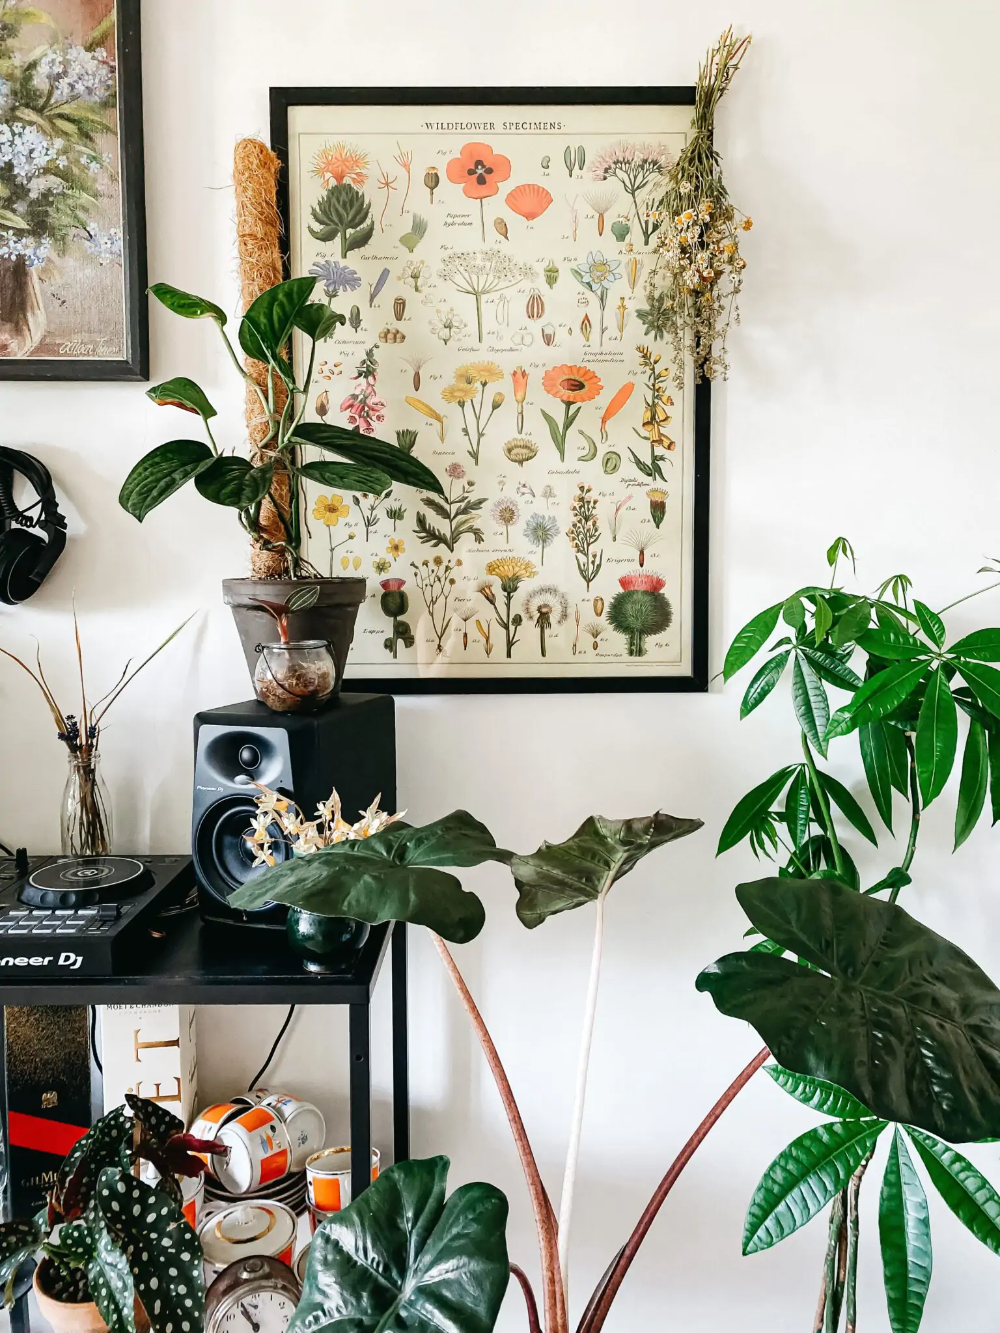 10 X Originele Wanddecoratie Tips Inspiratie Girls Who Magazine Plantendecor Kamerplant Decor Bordenhangers